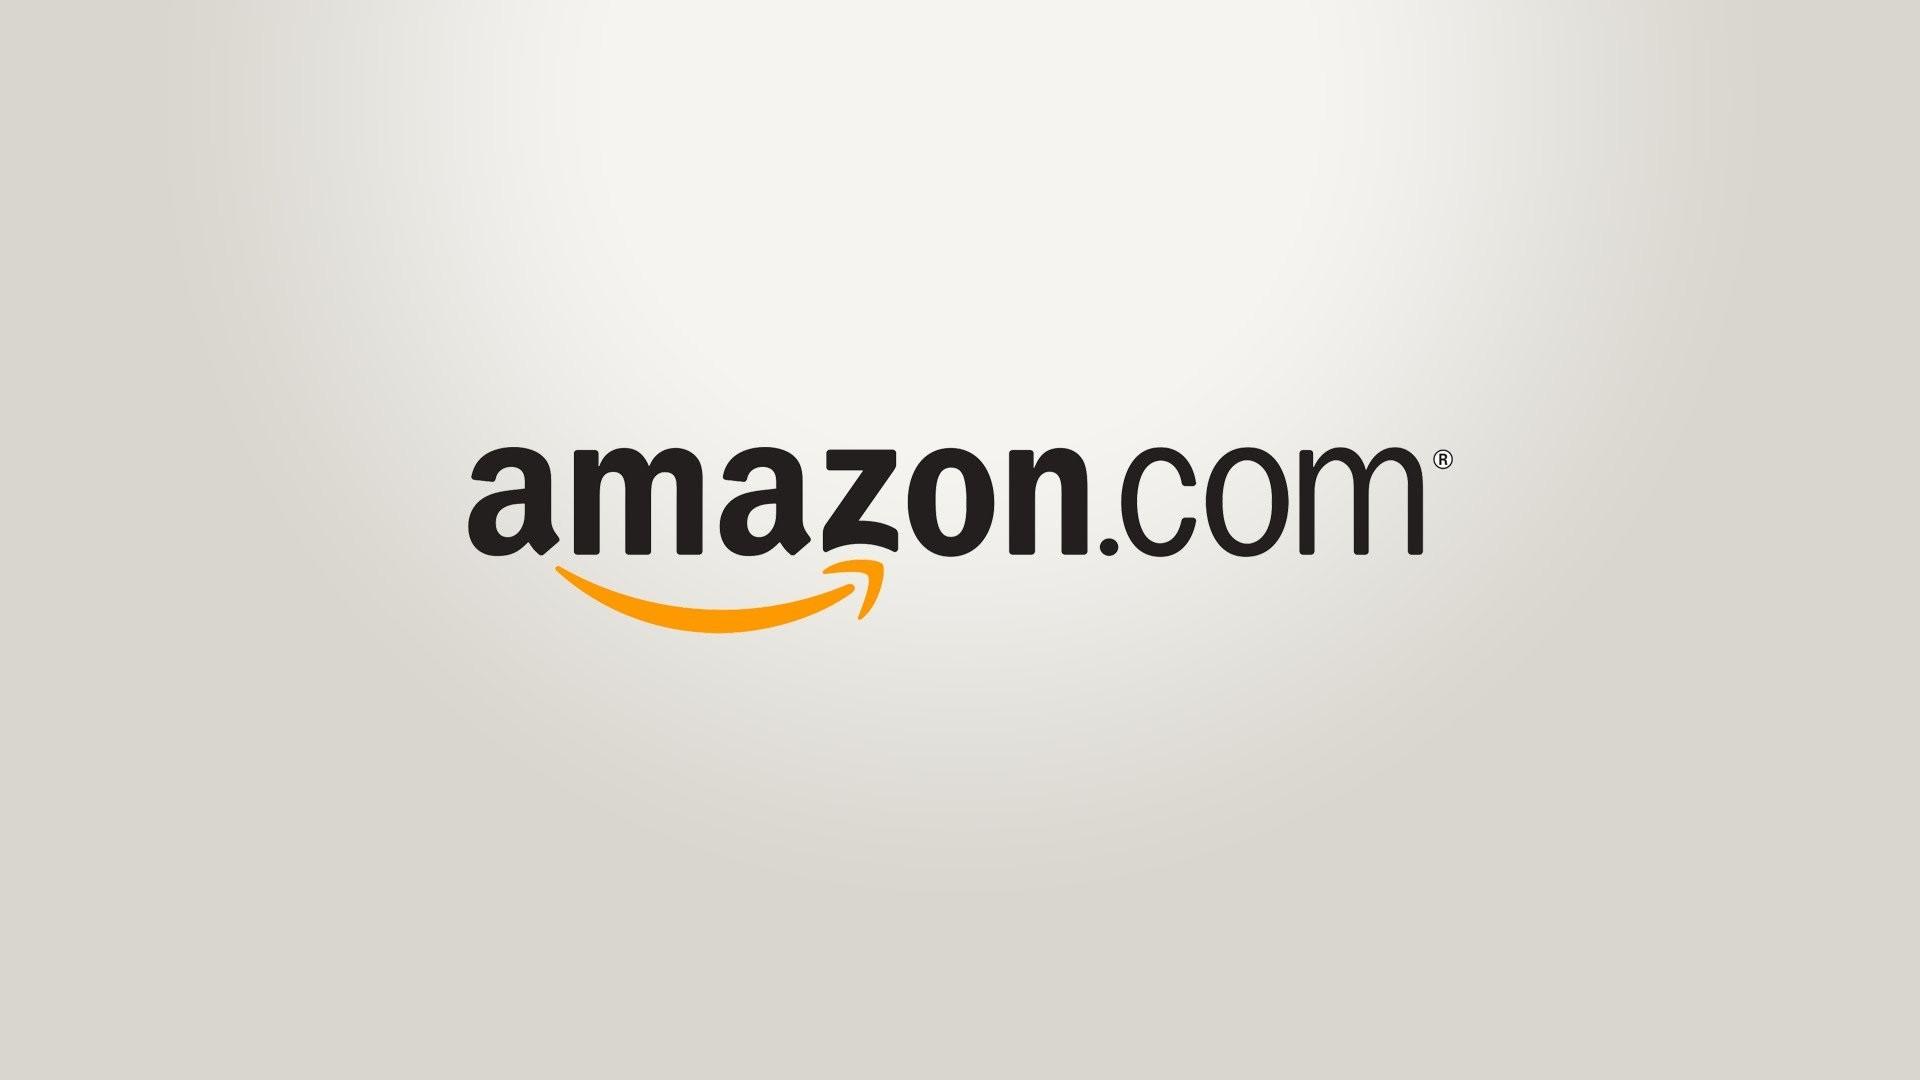 Amazon wallpaper photo hd